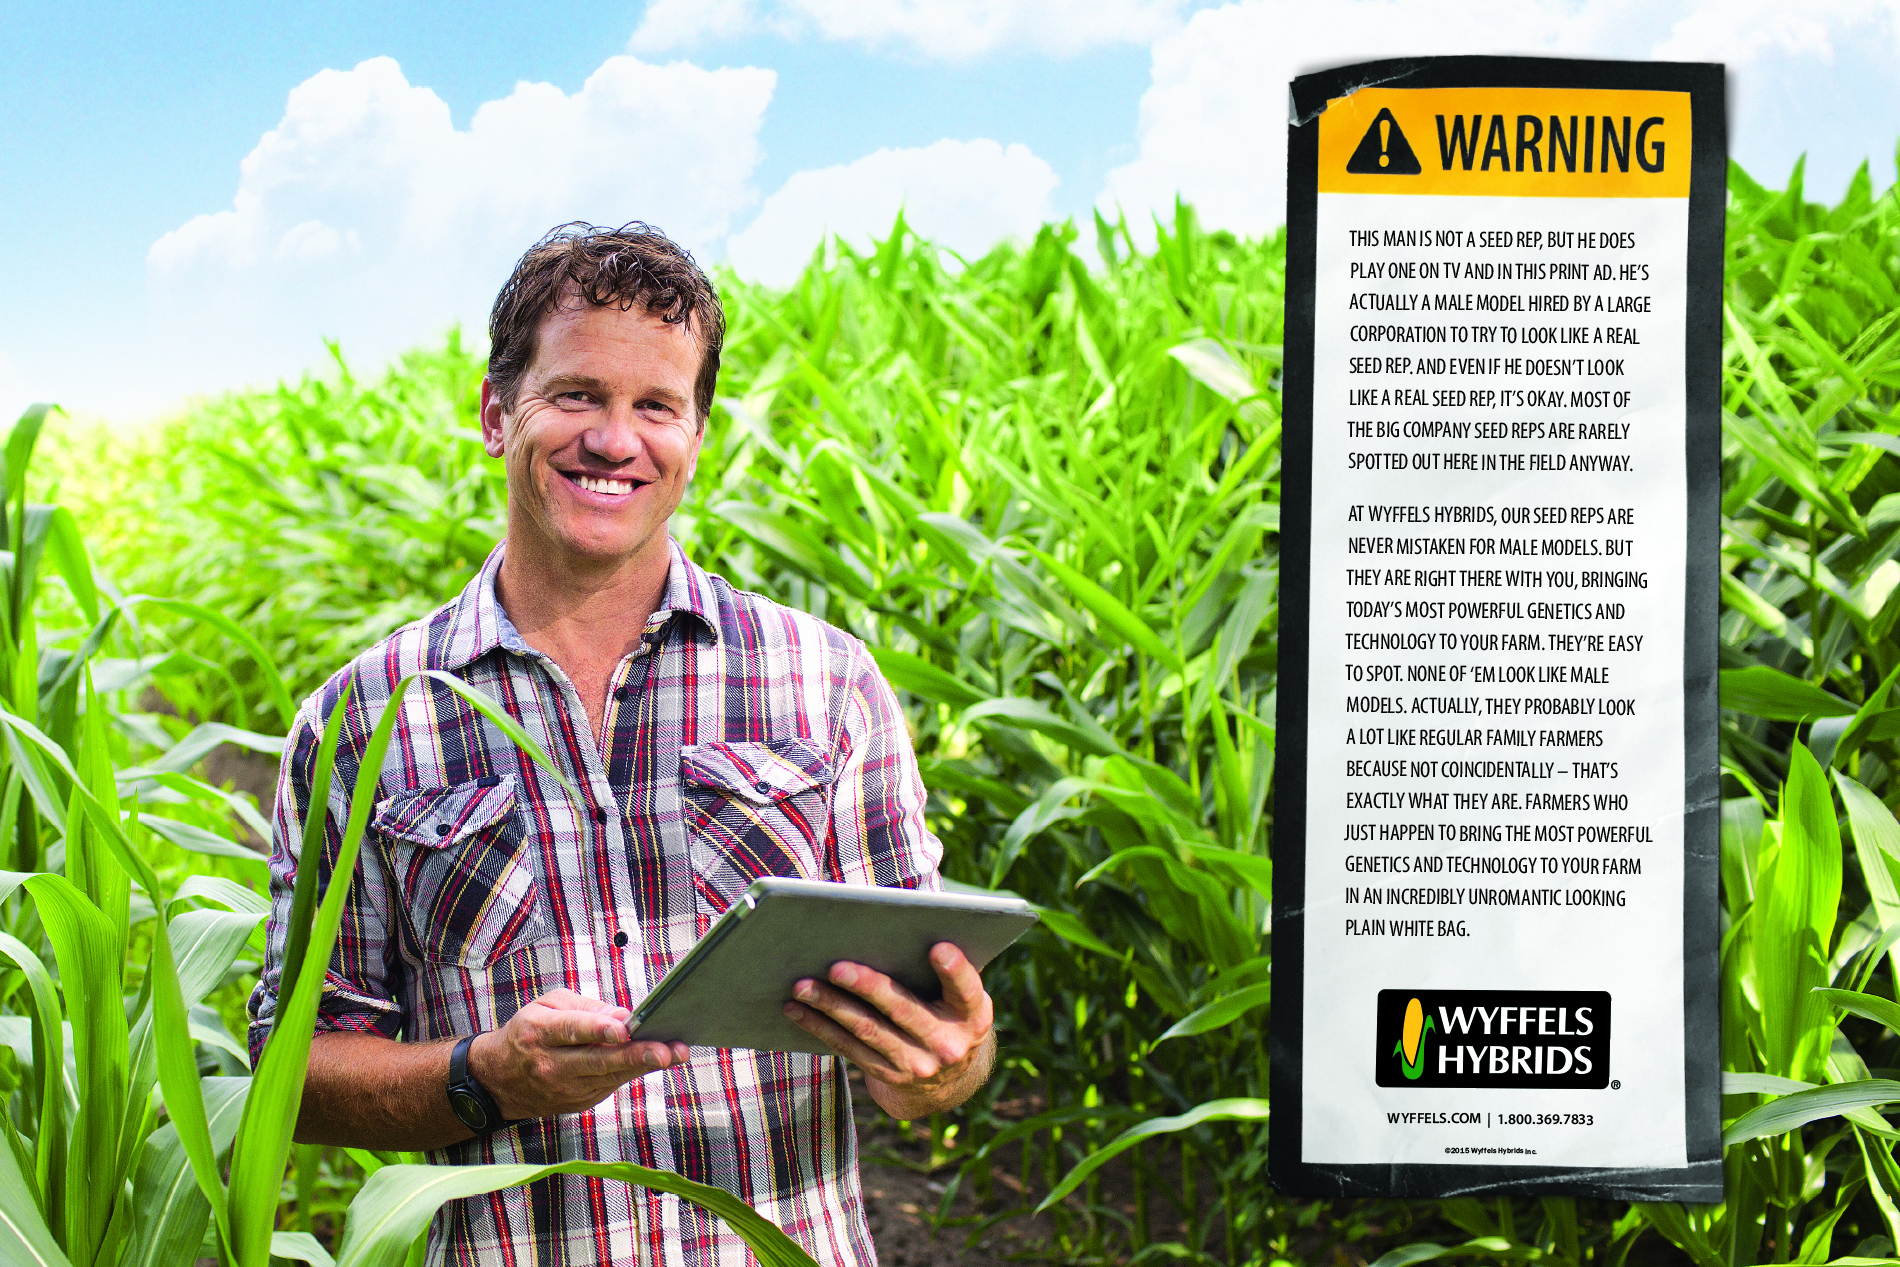 Wyffels Hybrids Advertising